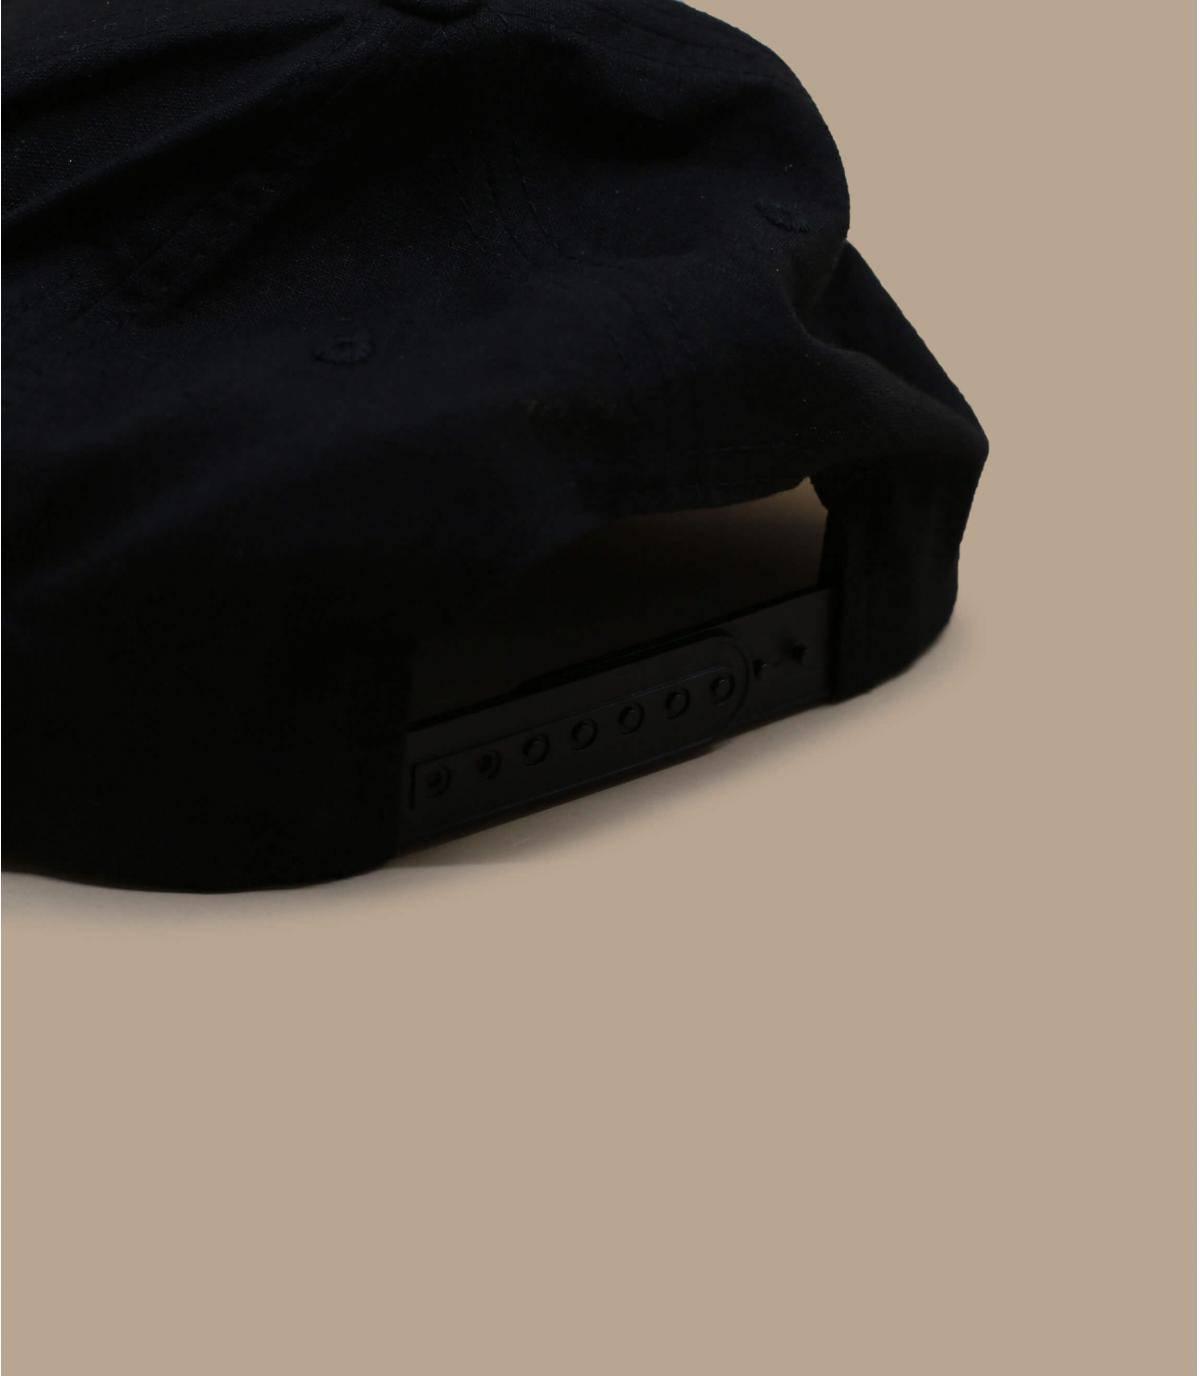 Details New Wave black - Abbildung 4